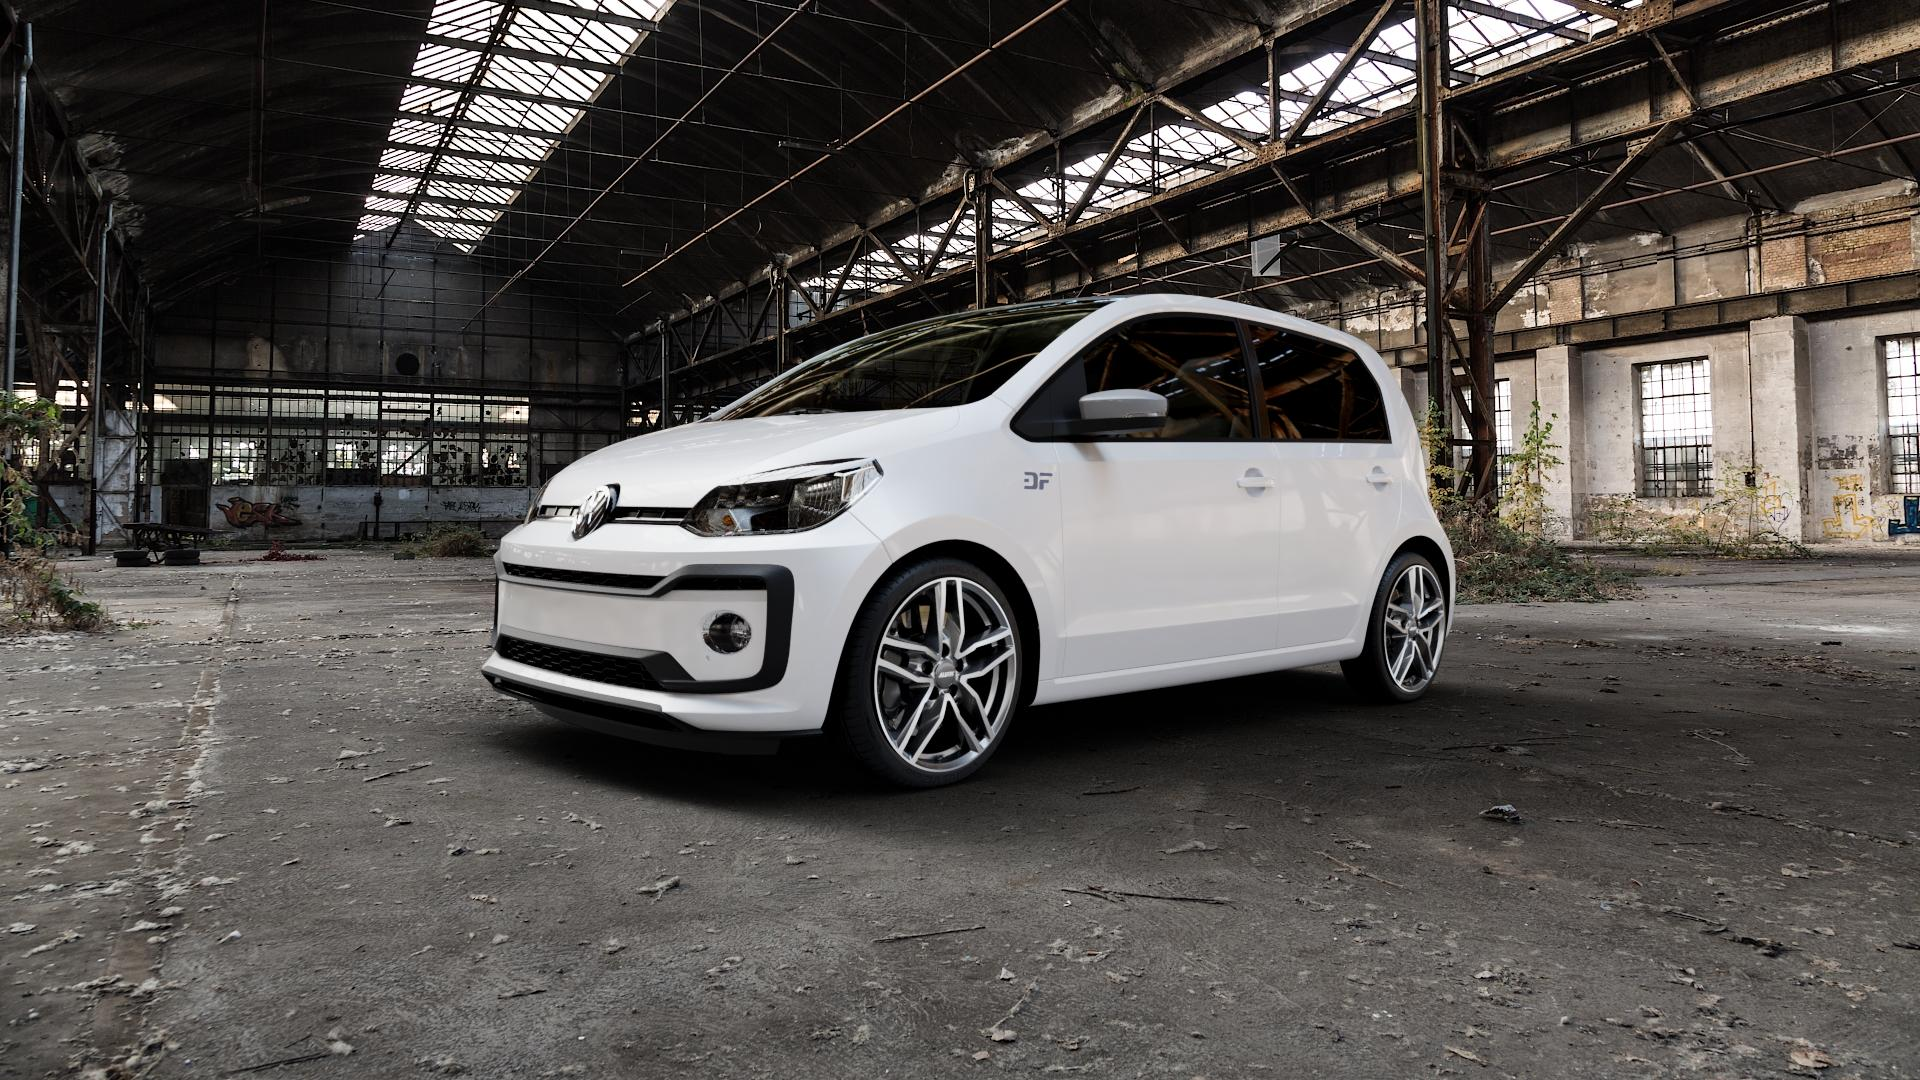 ALUTEC Ikenu graphit frontpoliert Felge mit Reifen grau mehrfarbig in 17Zoll Alufelge auf weissem Volkswagen (VW) UP Facelift 1,0l 44kW (60 PS) 55kW (75 eco-Up 50kW (68 TSI 66kW (90 85kW GTi (116 ⬇️ mit 15mm Tieferlegung ⬇️ Industriehalle 1 Camera_000